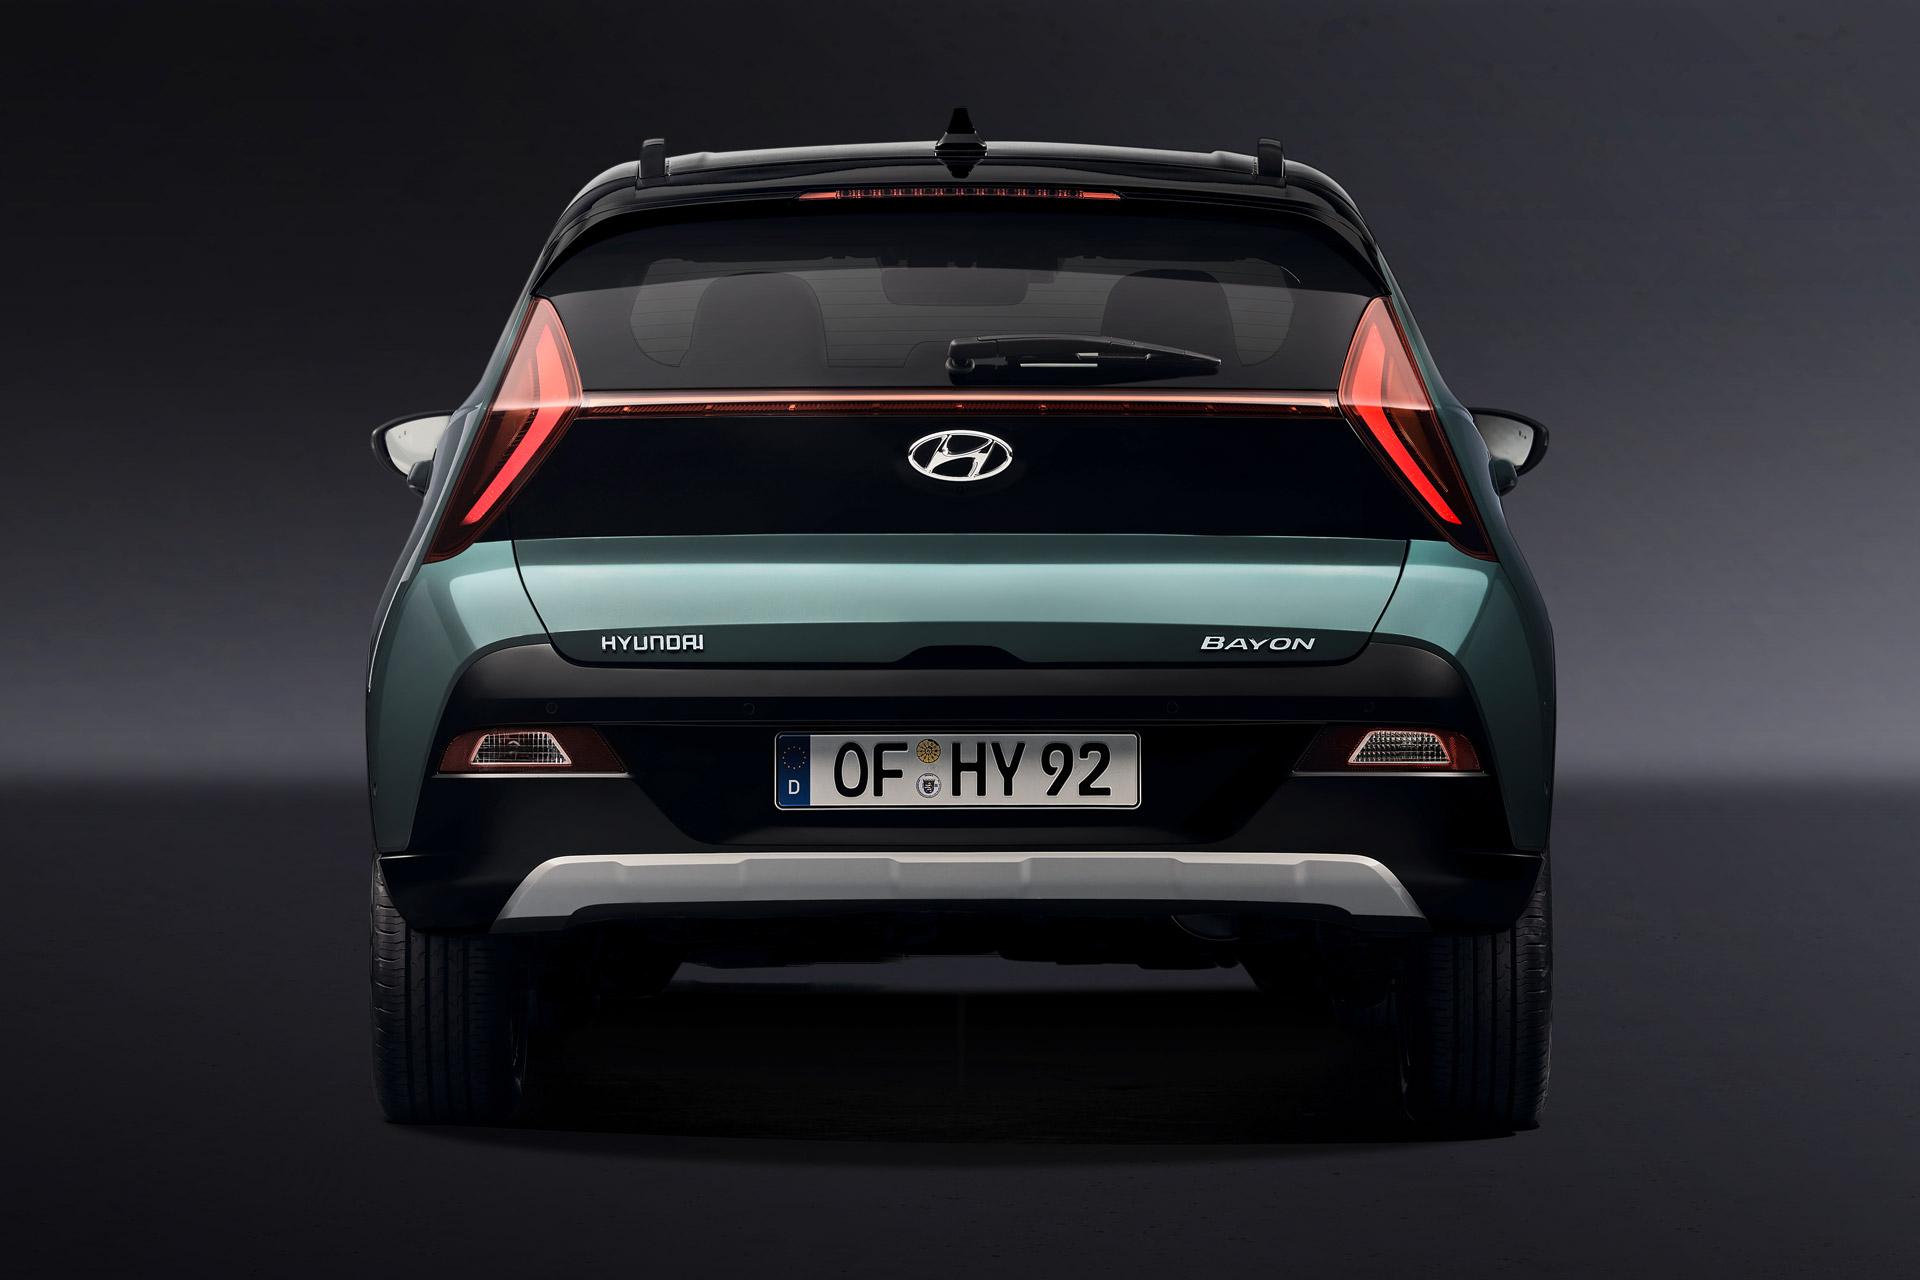 Hyundai BAYON bagfra